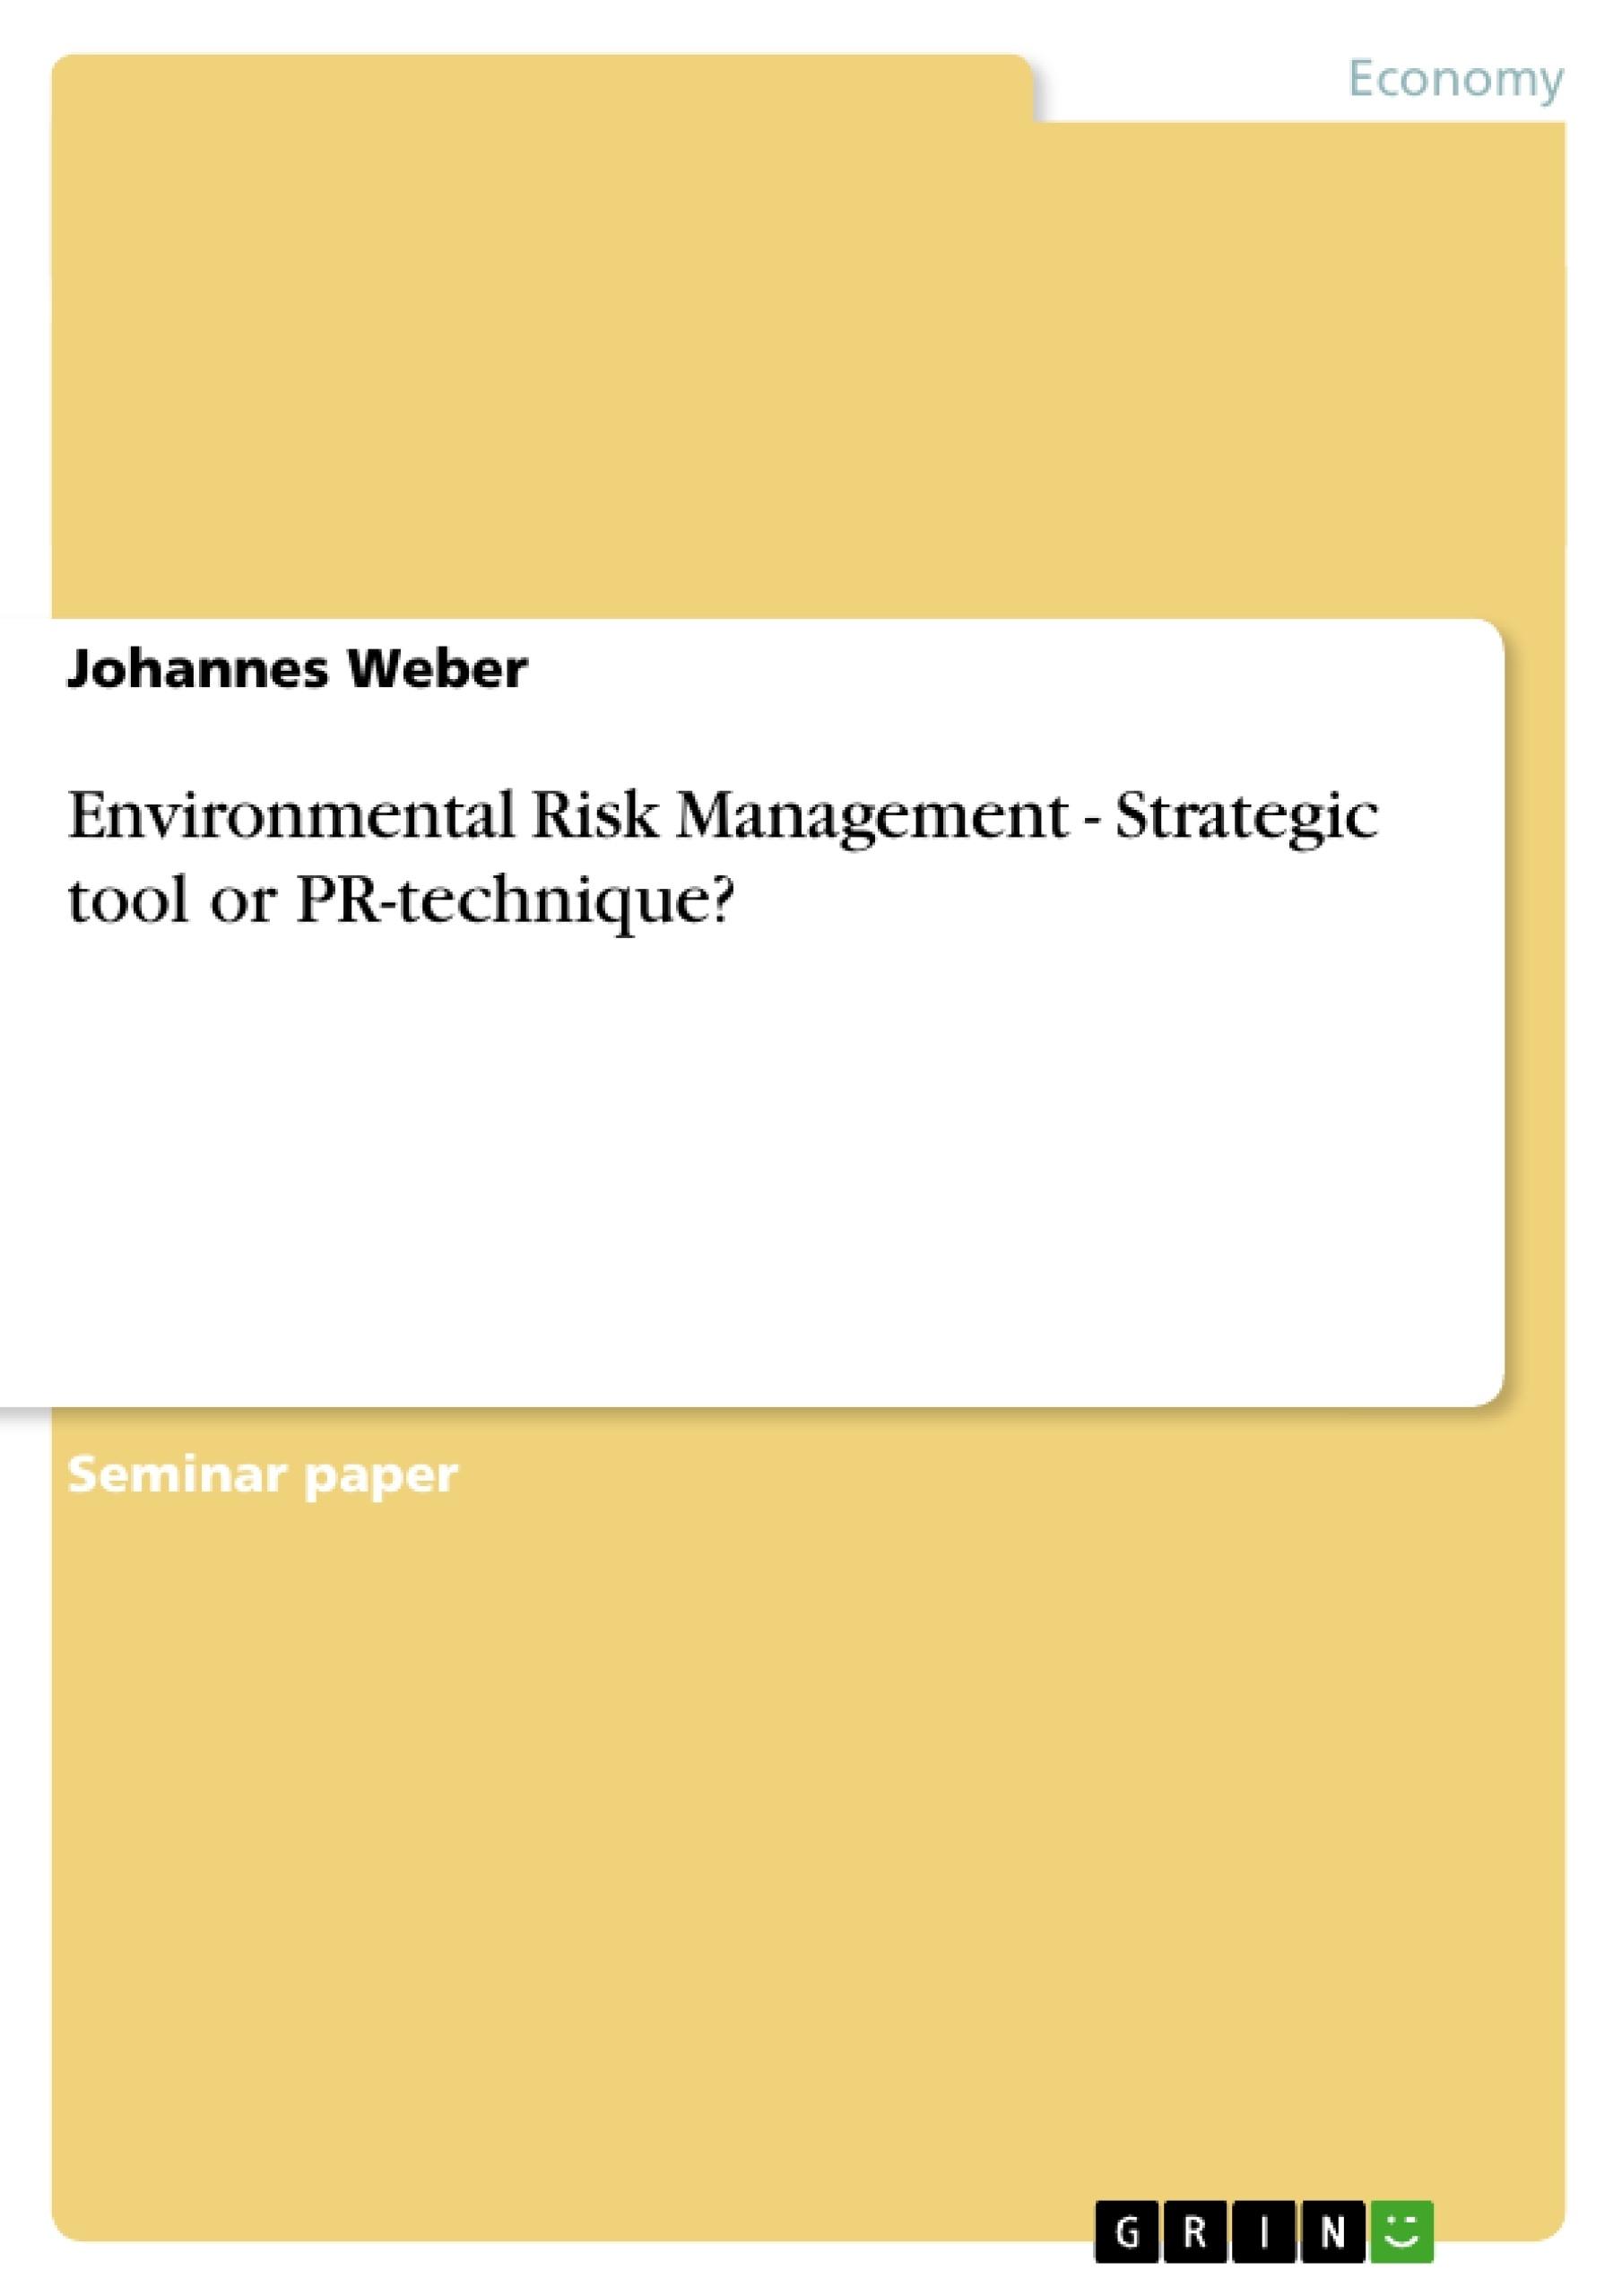 Title: Environmental Risk Management - Strategic tool or PR-technique?